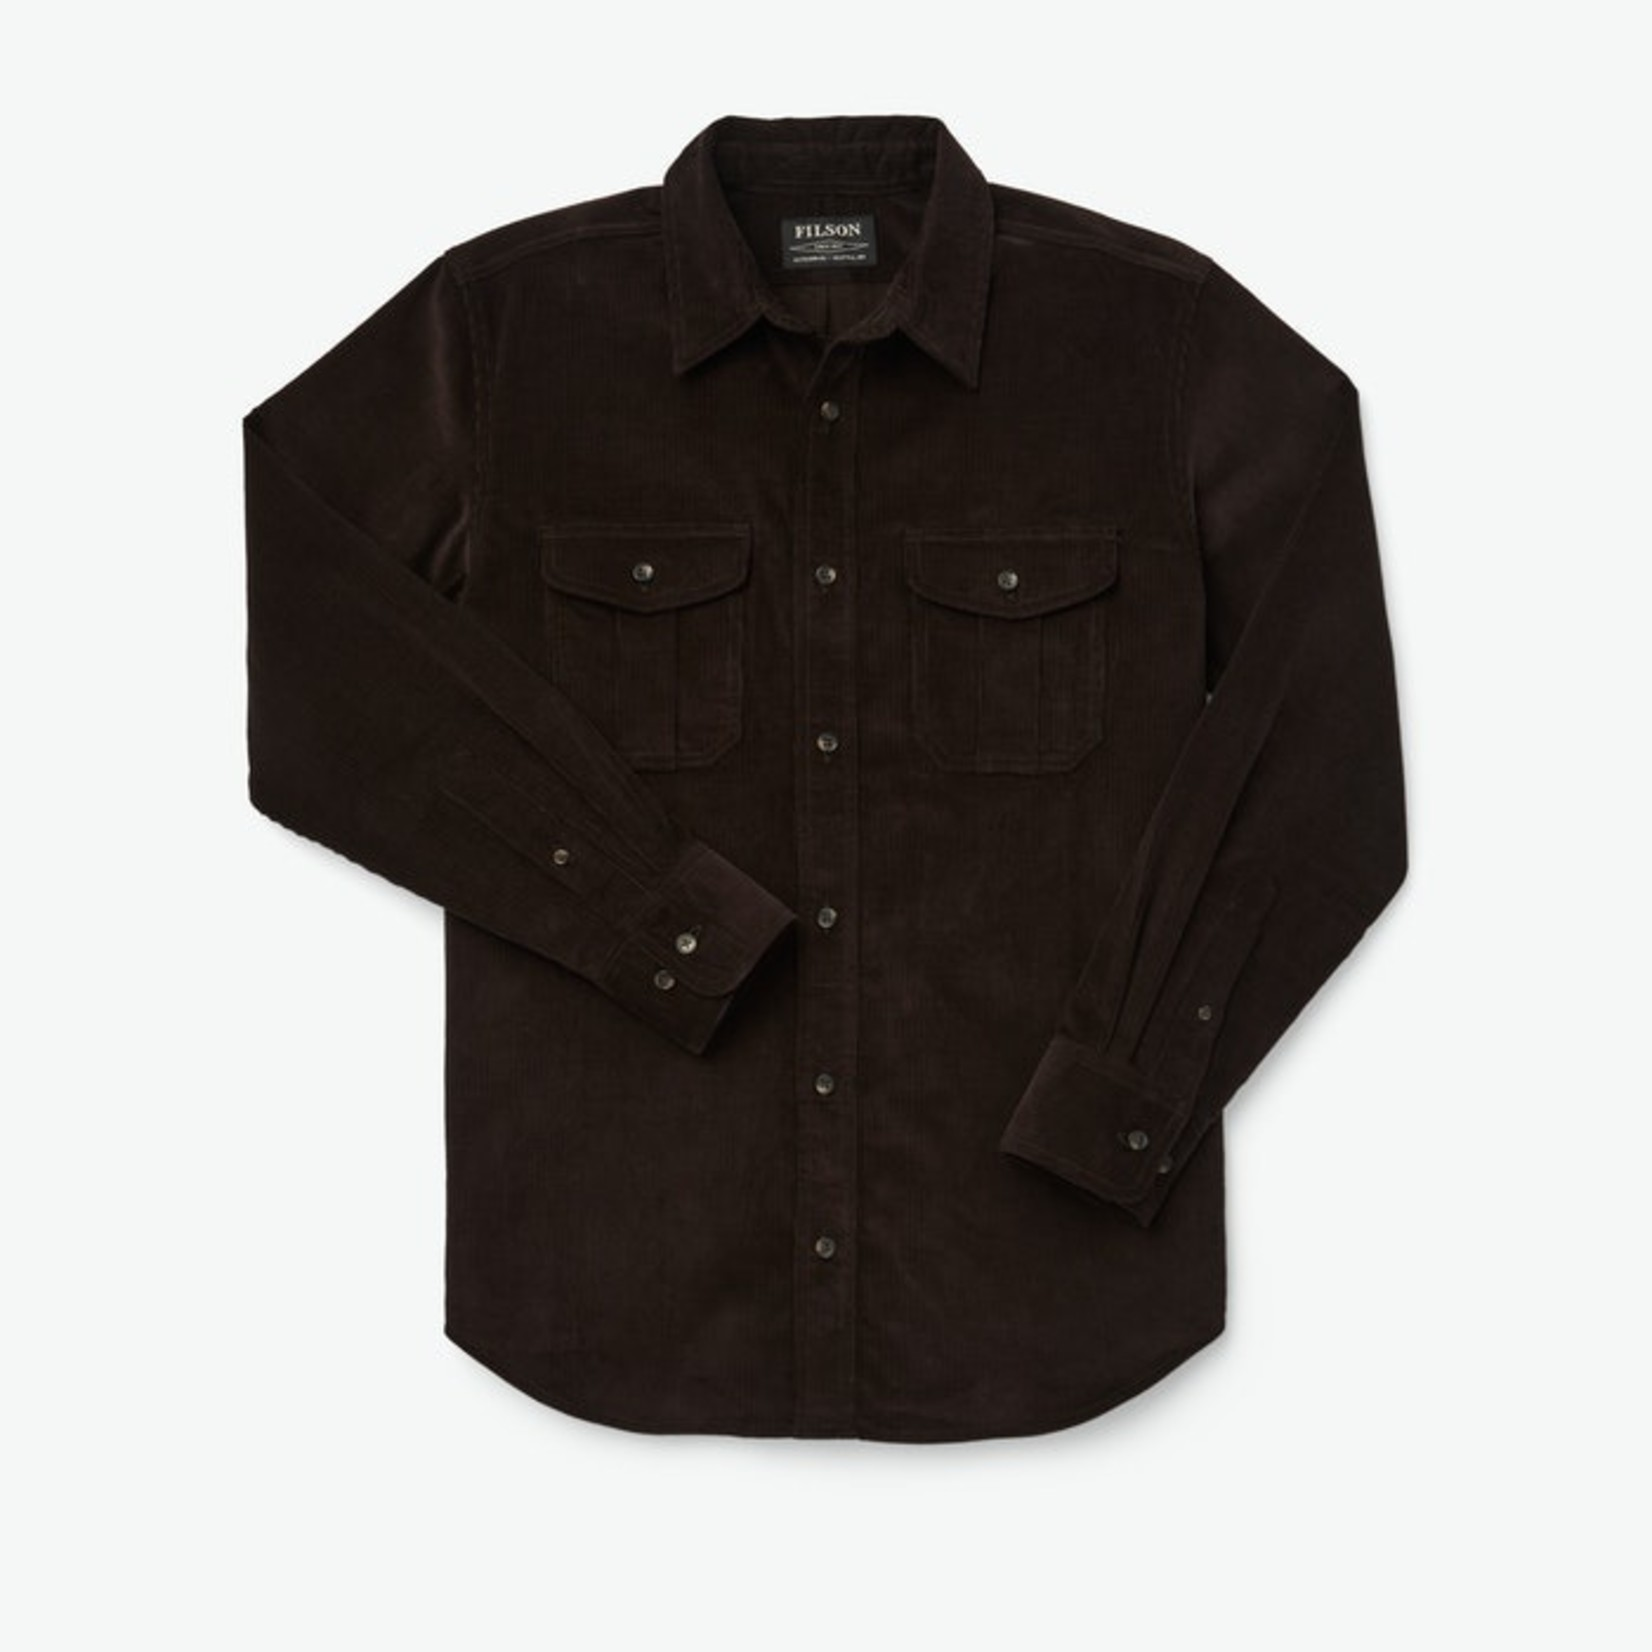 Filson Filson 20222928 12-Wale Corduroy Shirt Bison Brown